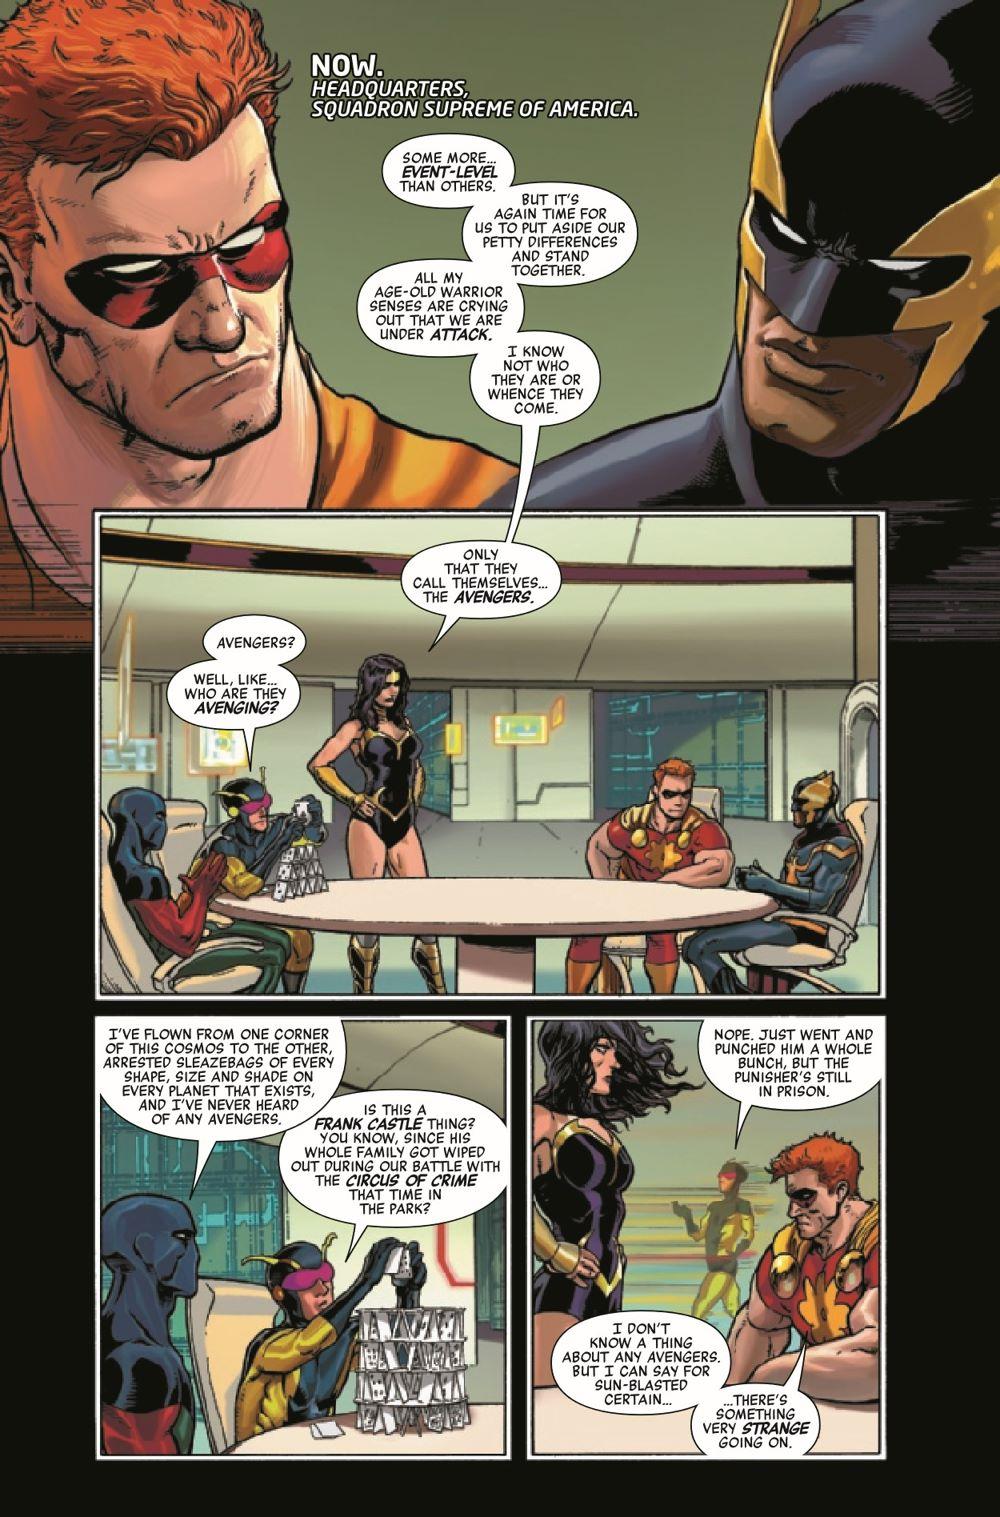 HEROESREBORN2021007_Preview-6 ComicList Previews: HEROES REBORN #7 (OF 7)